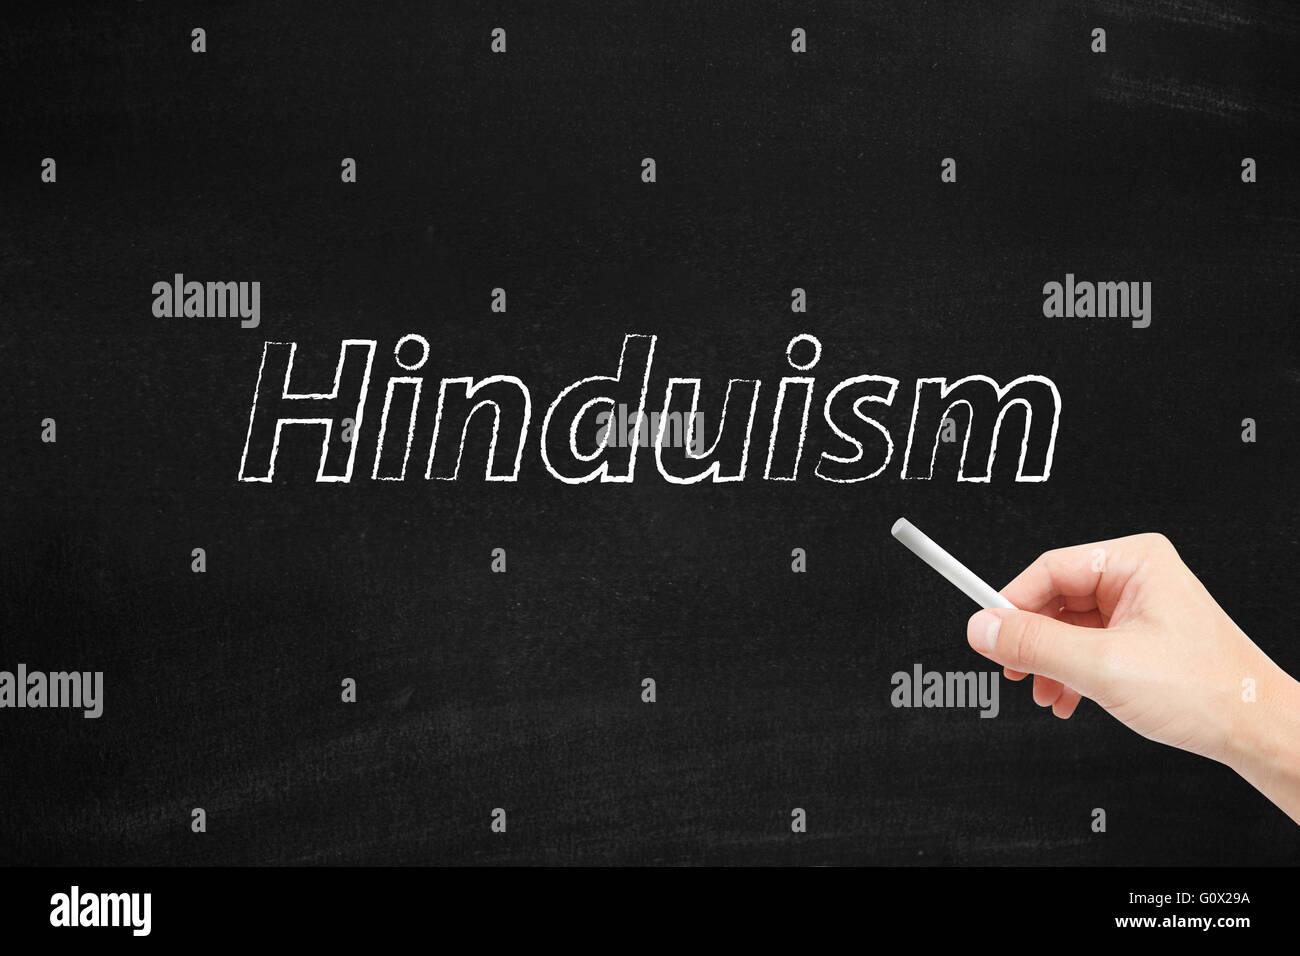 Hinduism written on a blackboard - Stock Image